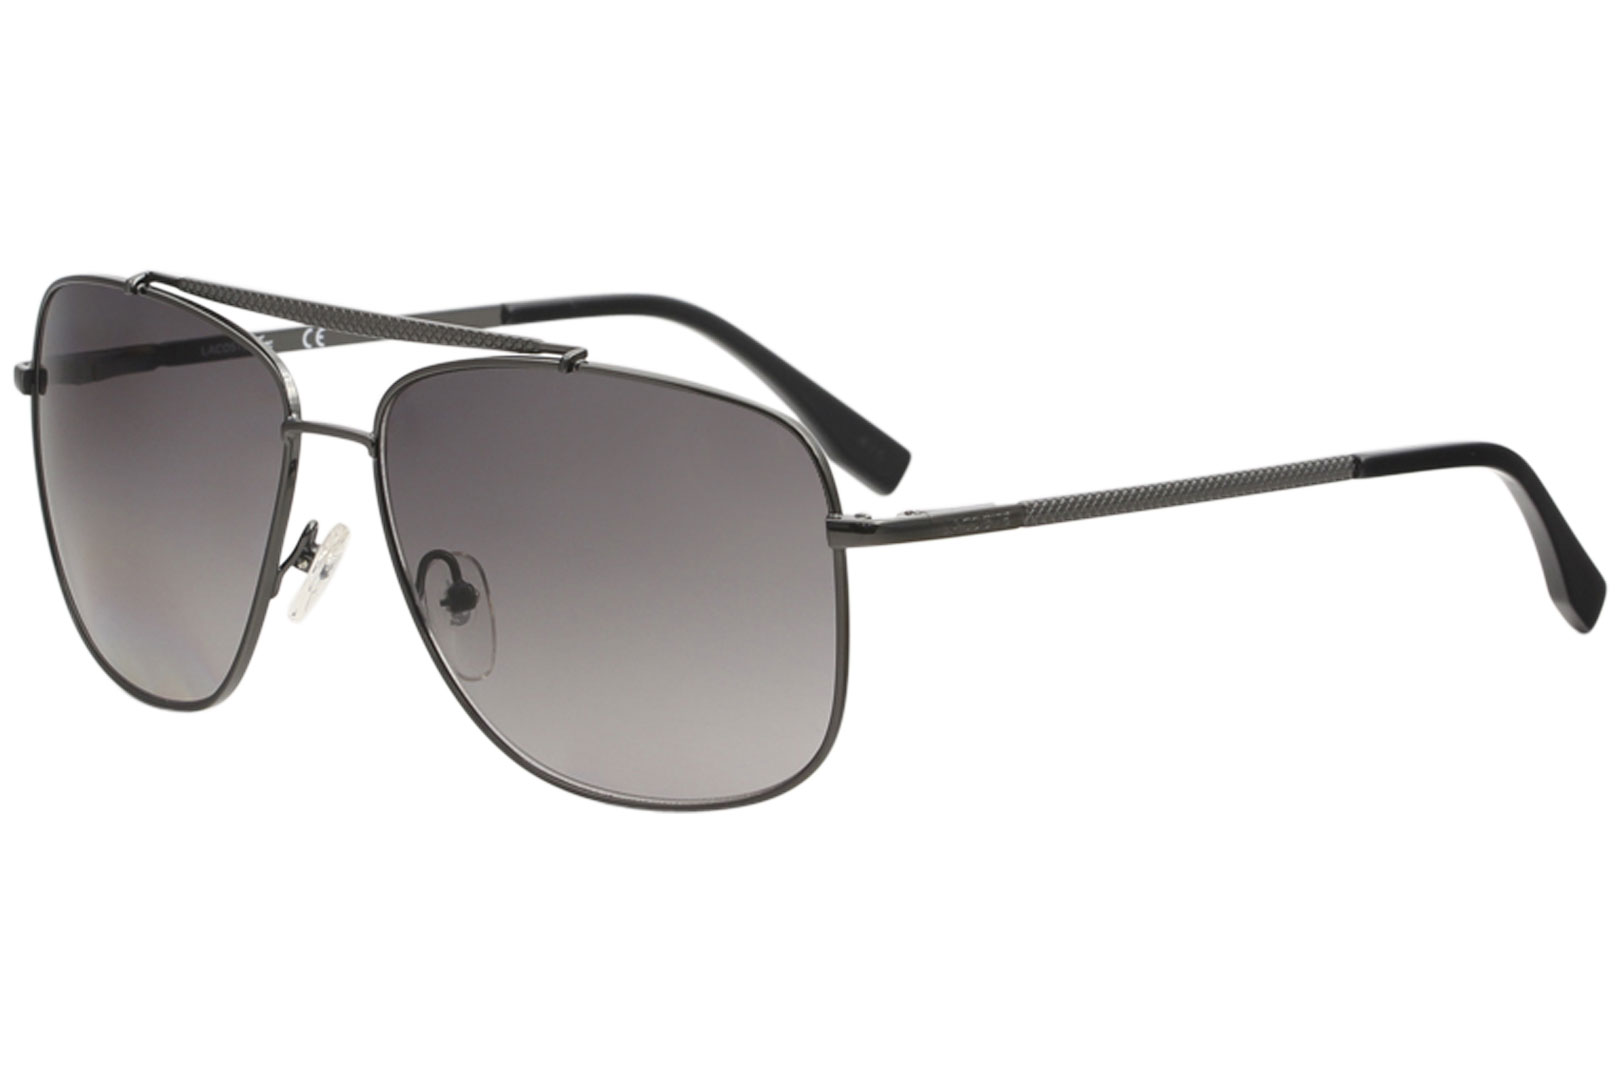 9e9b5fce78e Lacoste Men s L188S L 188 S 033 Gunmetal Fashion Pilot Sunglasses ...